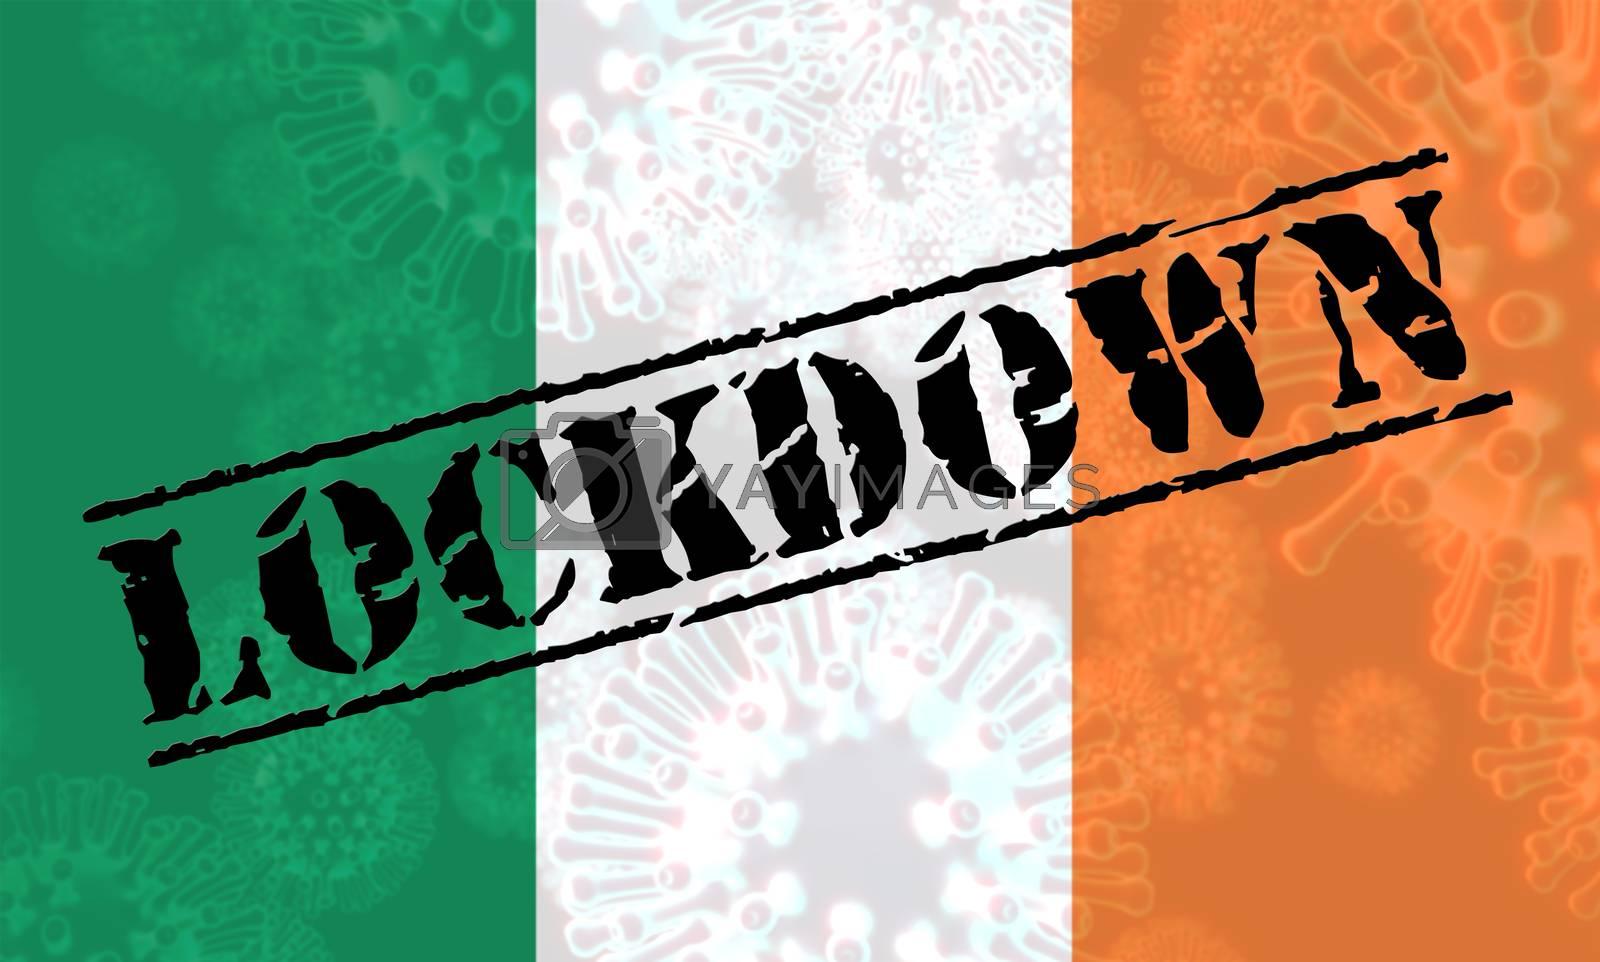 Irish lockdown or curfew to stop covid19 epidemic. Covid 19 Ireland precaution to isolate virus infection - 3d Illustration